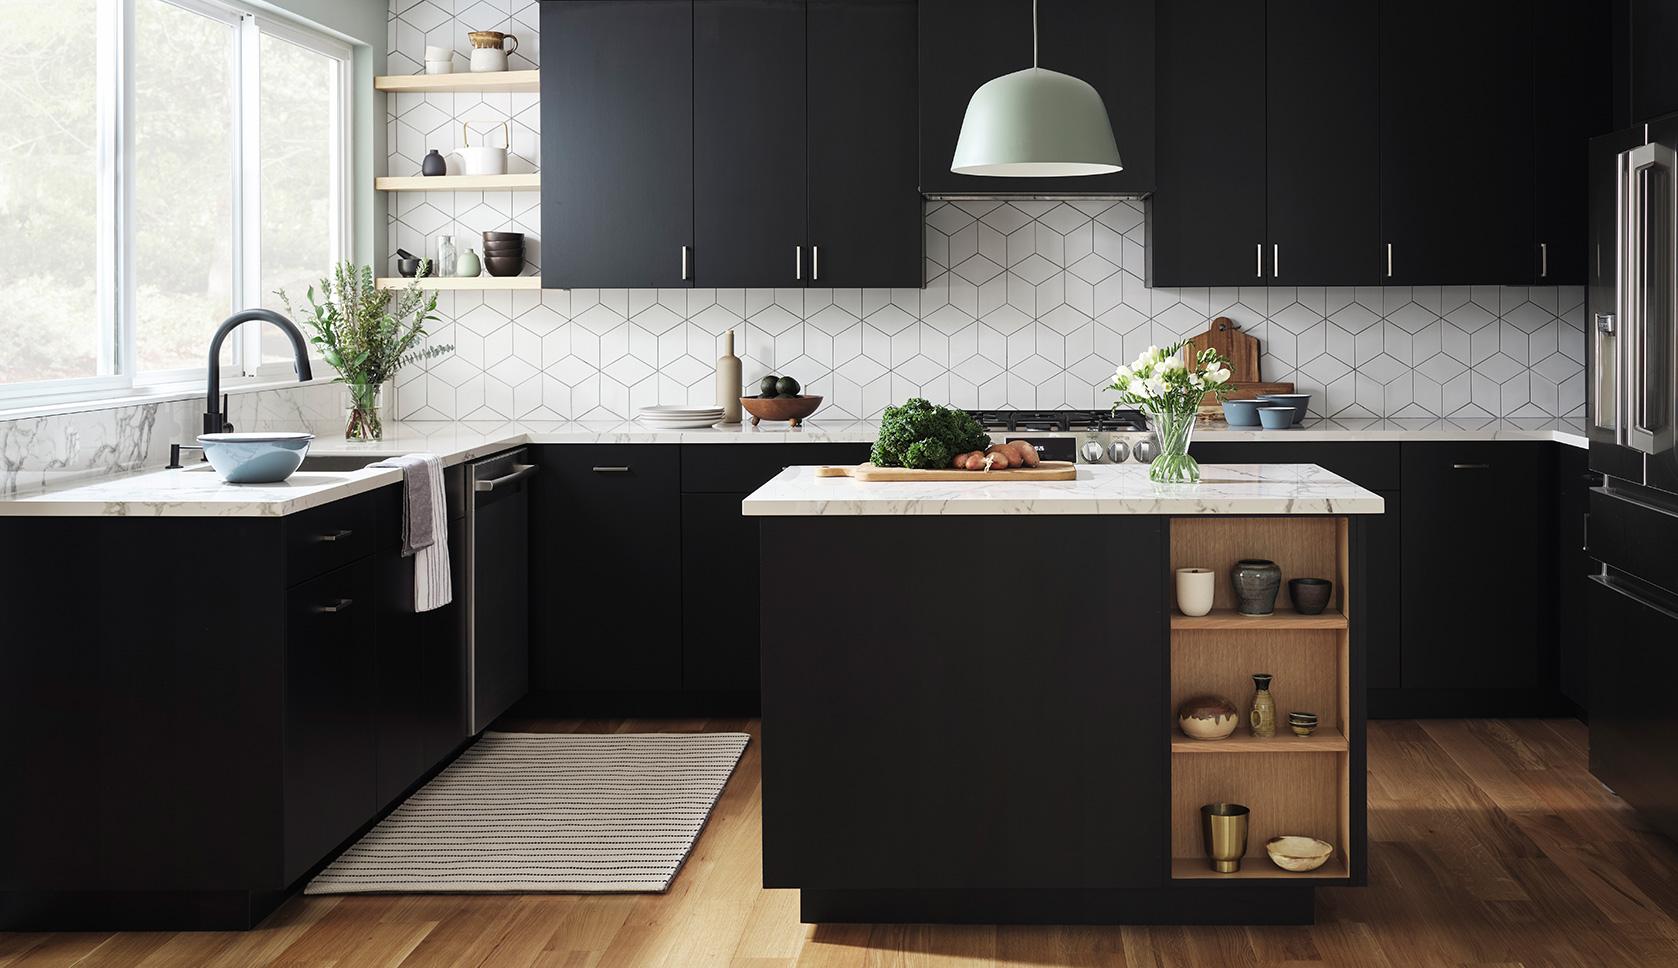 black Scandinavian kitchen with natural wood and geometric blacksplash